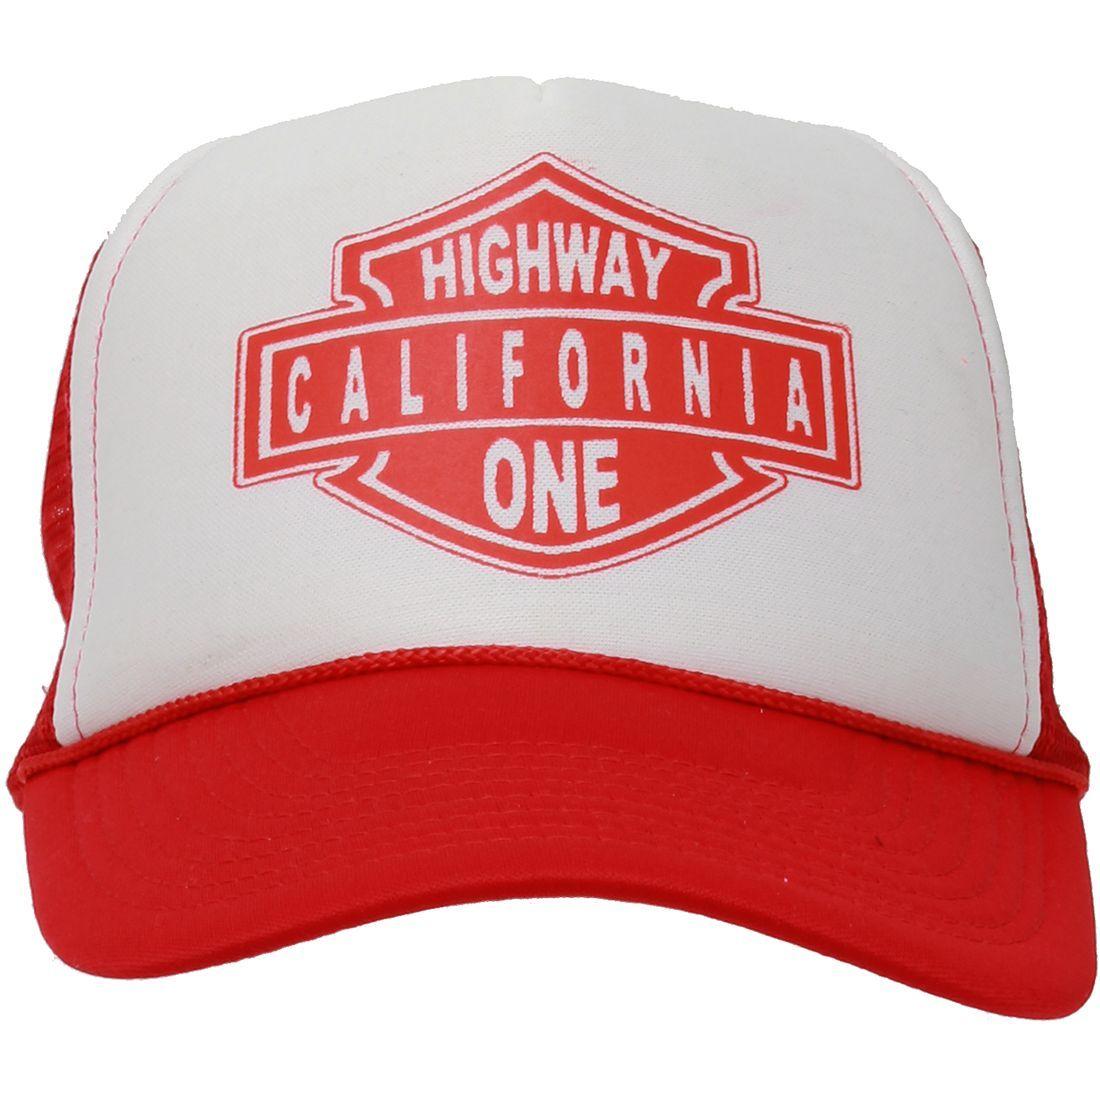 California Republic Highway One Snapback Hat On Orange And